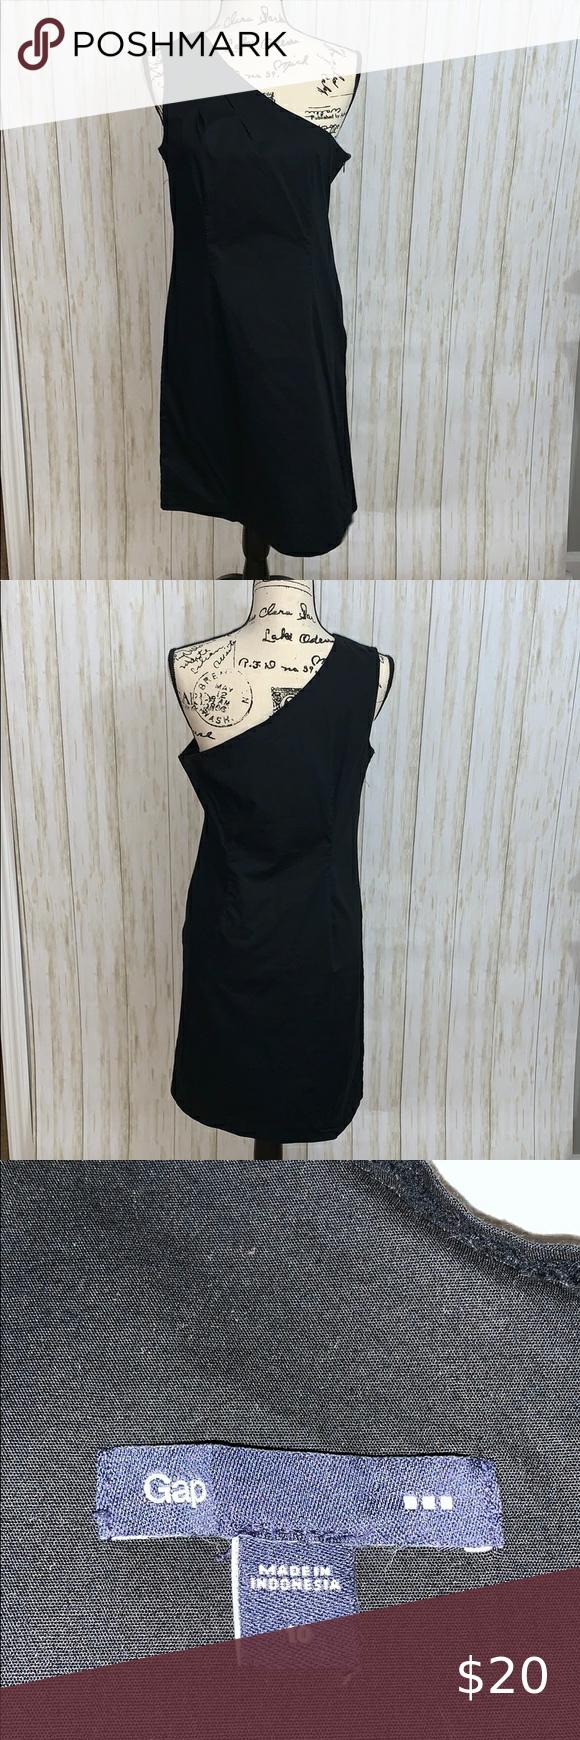 Size 10 Gap Factory Black Dress Black Dress Size 10 Black Dress Dress First [ 1740 x 580 Pixel ]